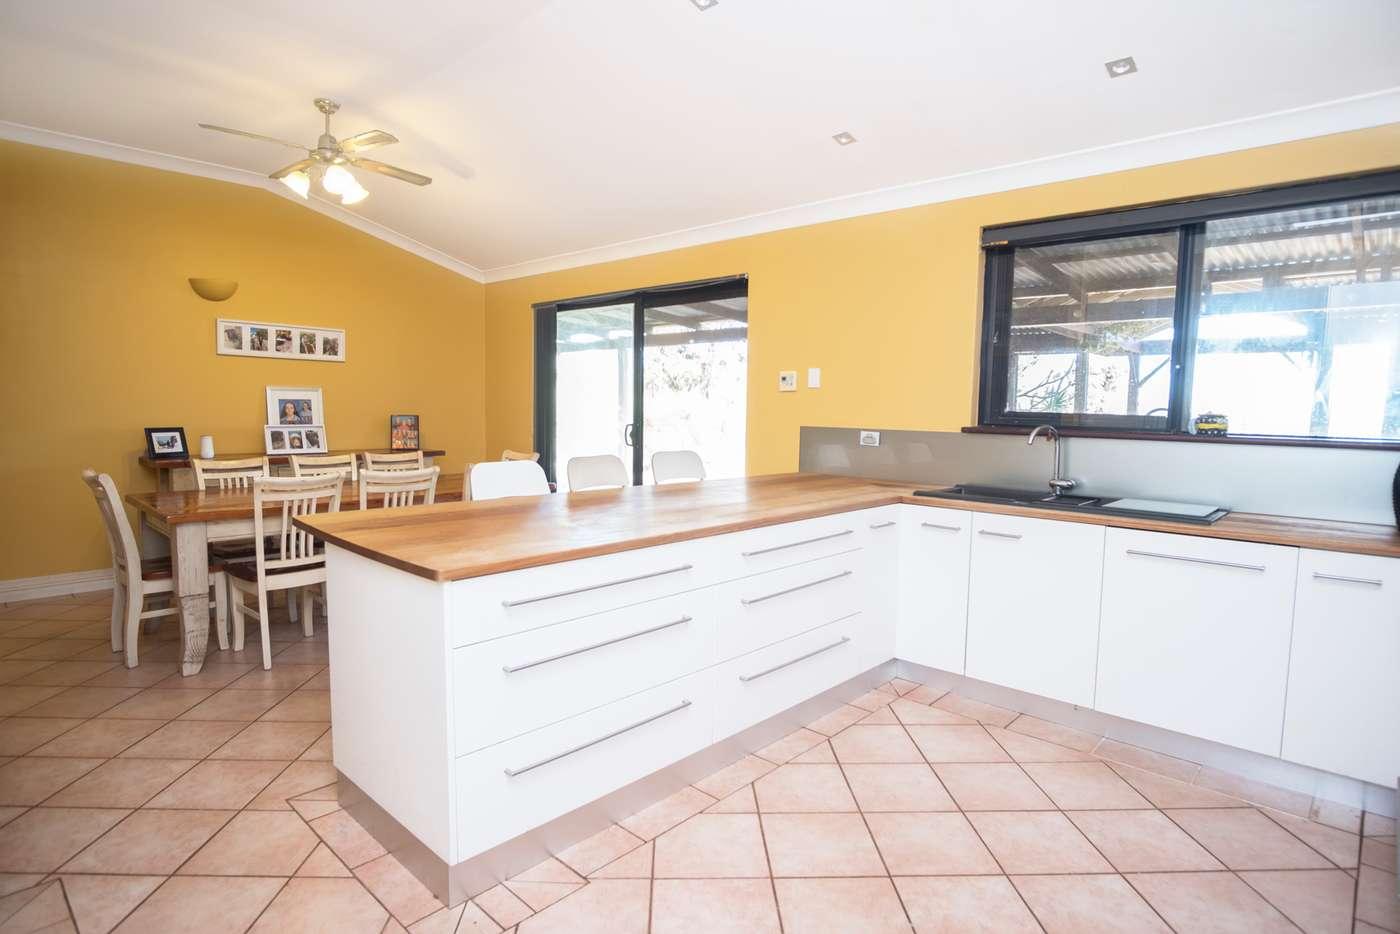 Main view of Homely house listing, 347 King Drive, Woodridge WA 6041